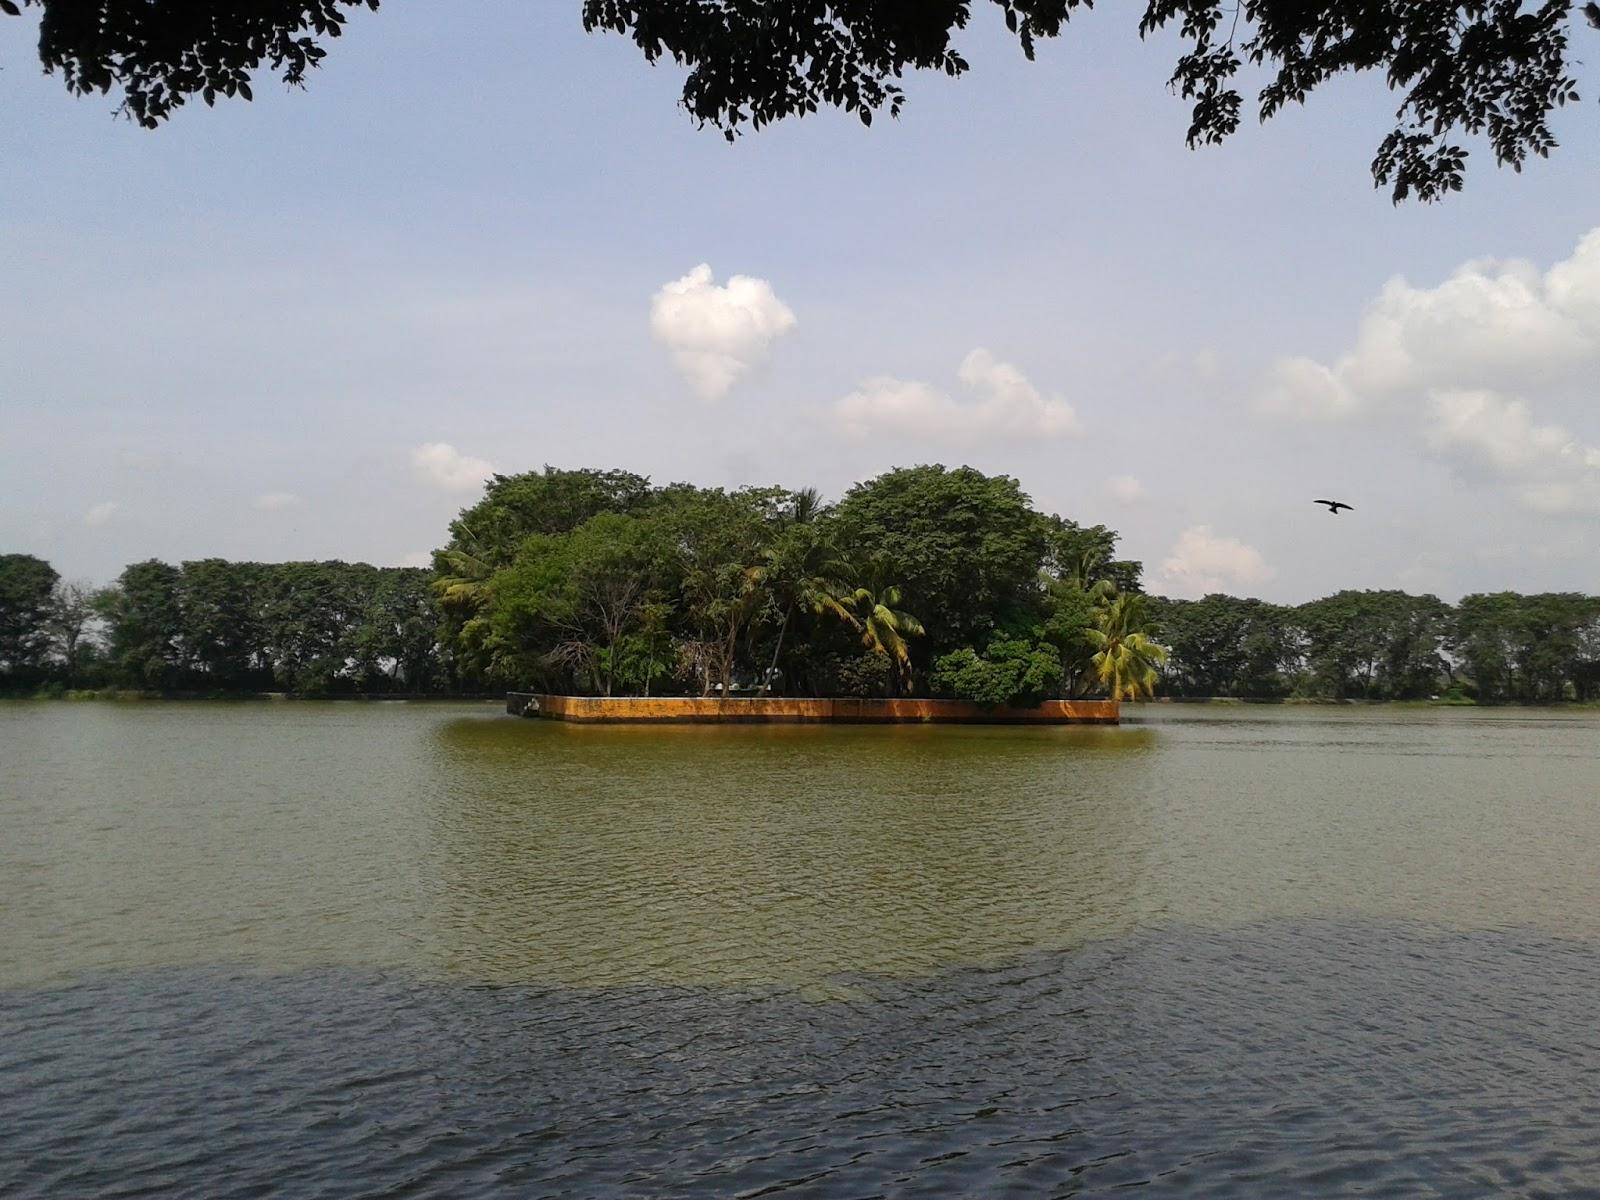 Potret Danau Tasikardi Banten | Foto: ksmtour.com